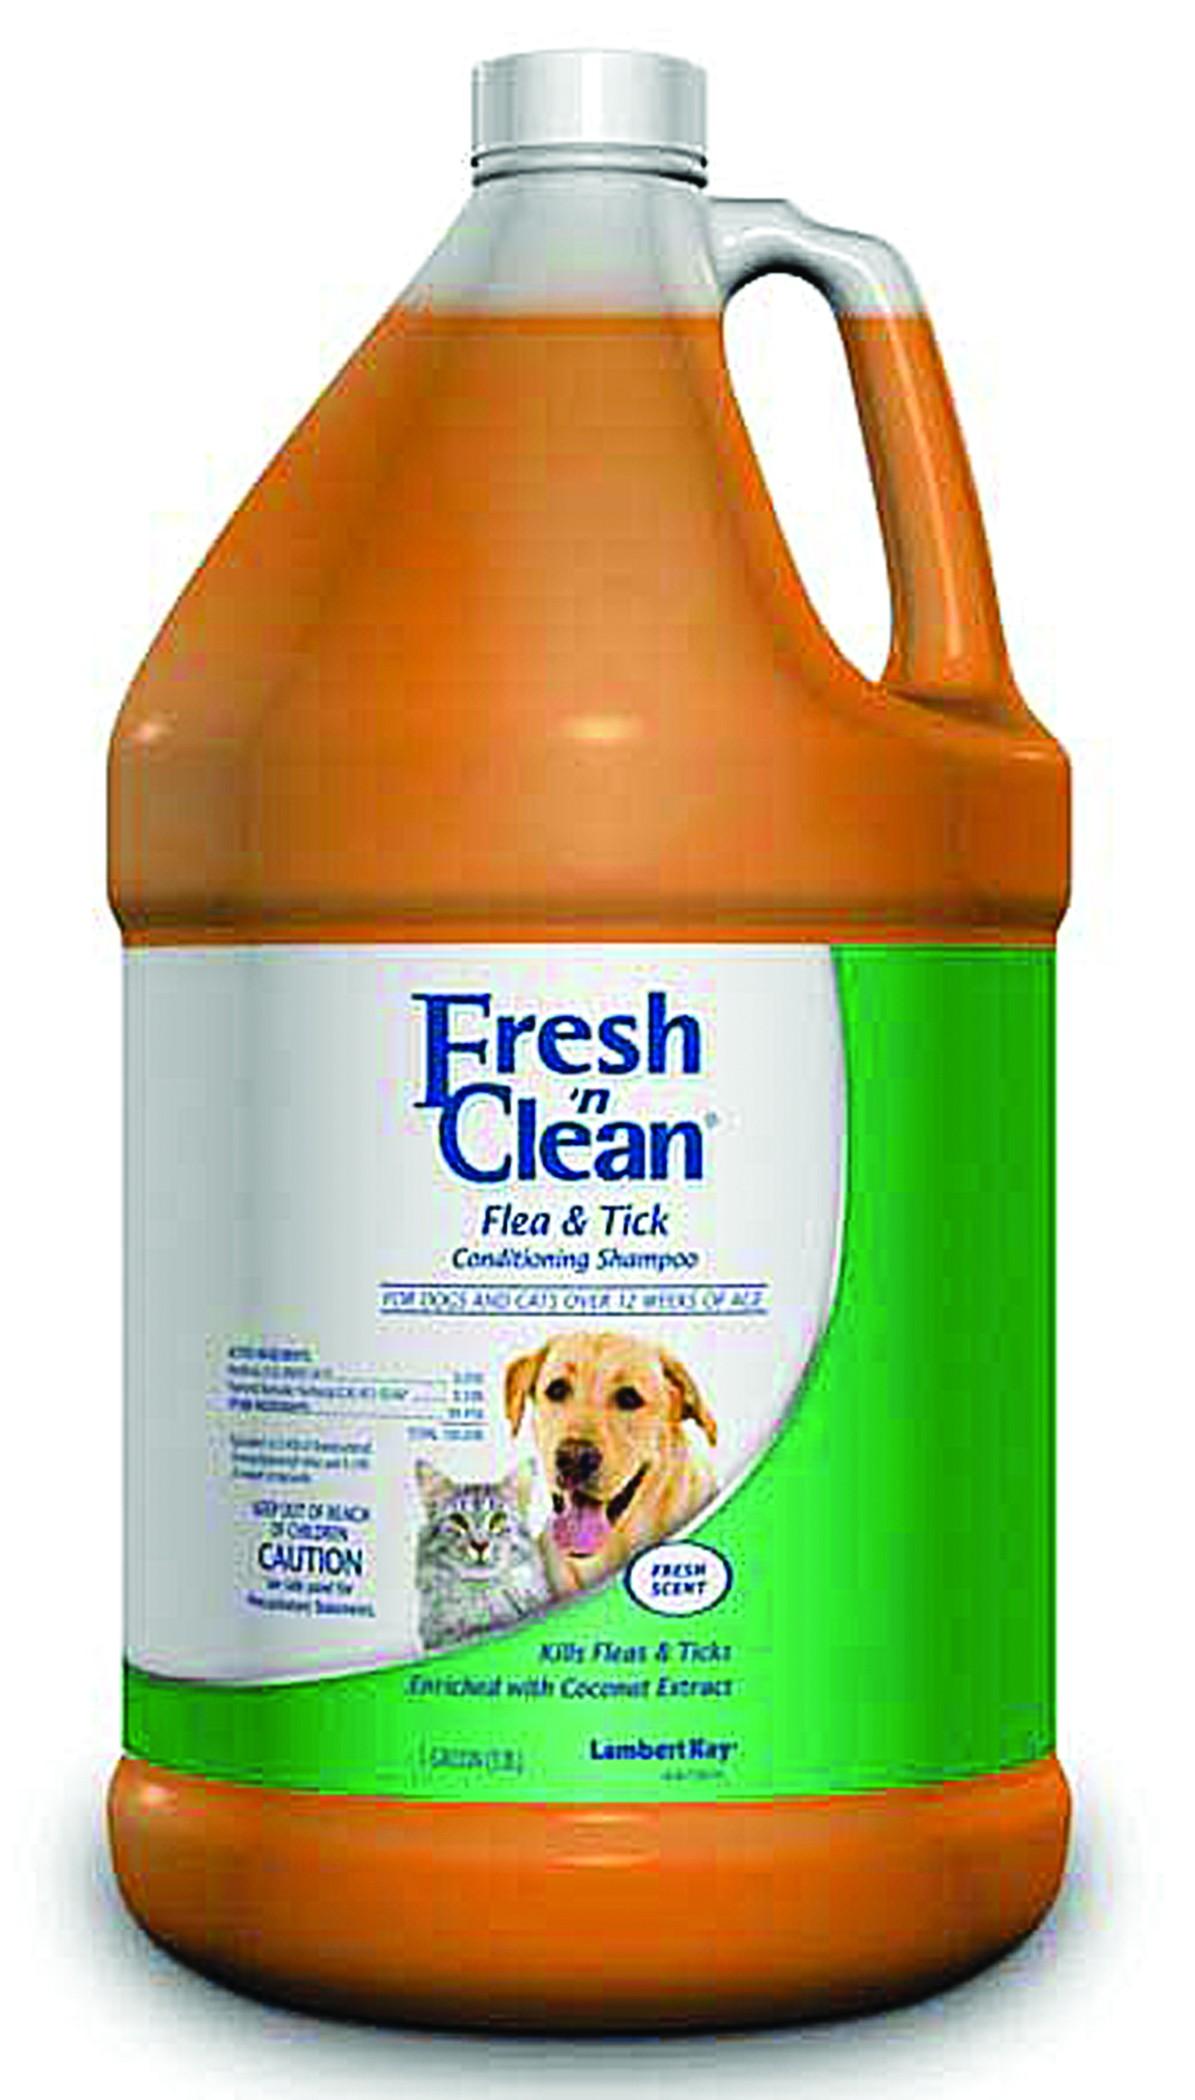 FRESH  N CLEAN FLEA & TICK CONDITIONING SHAMPOO